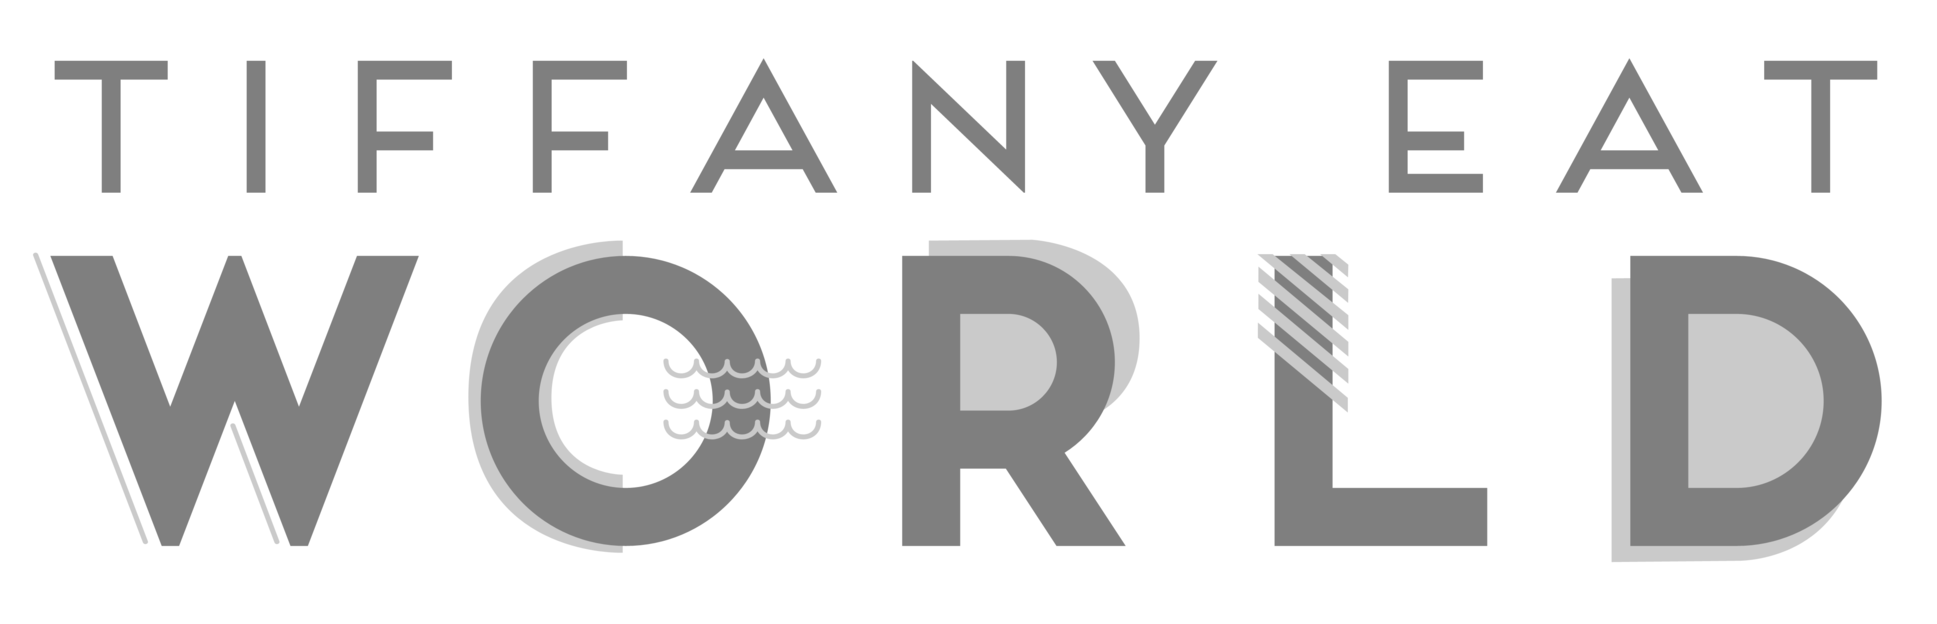 tiffany-concept-2.png